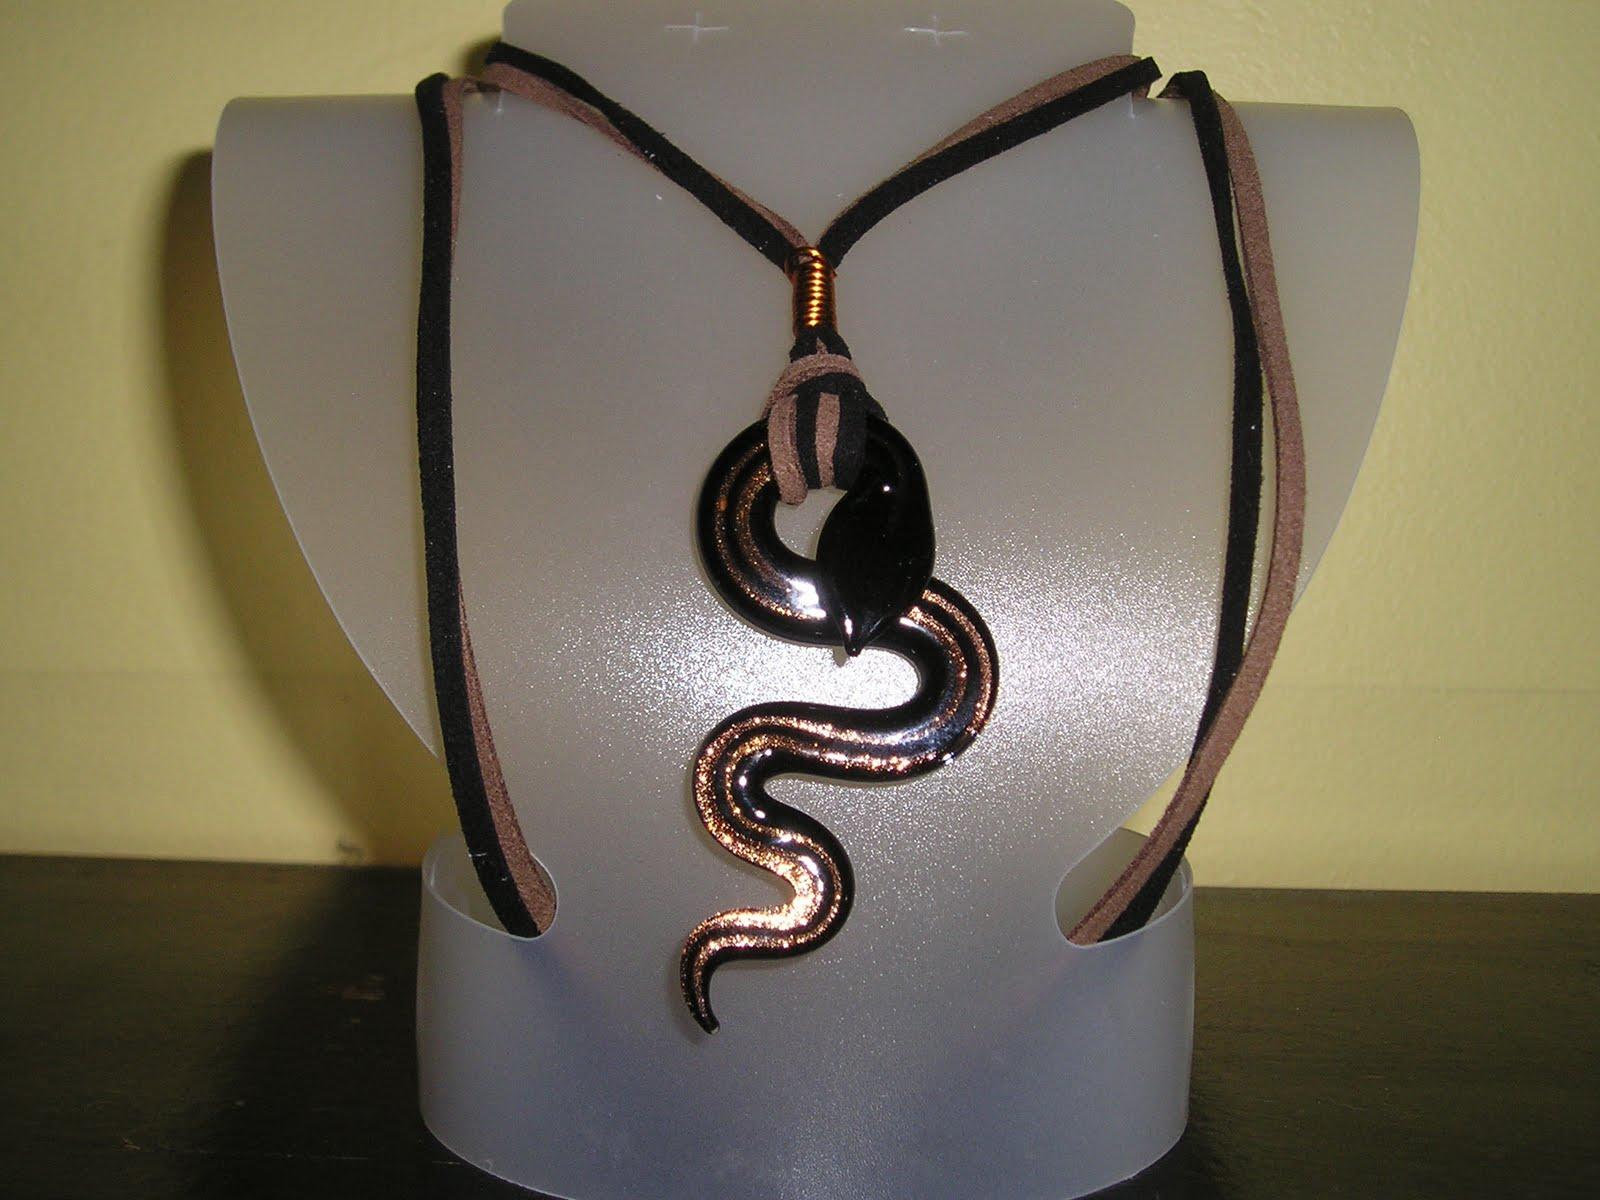 bijoux chatouille collier serpent. Black Bedroom Furniture Sets. Home Design Ideas